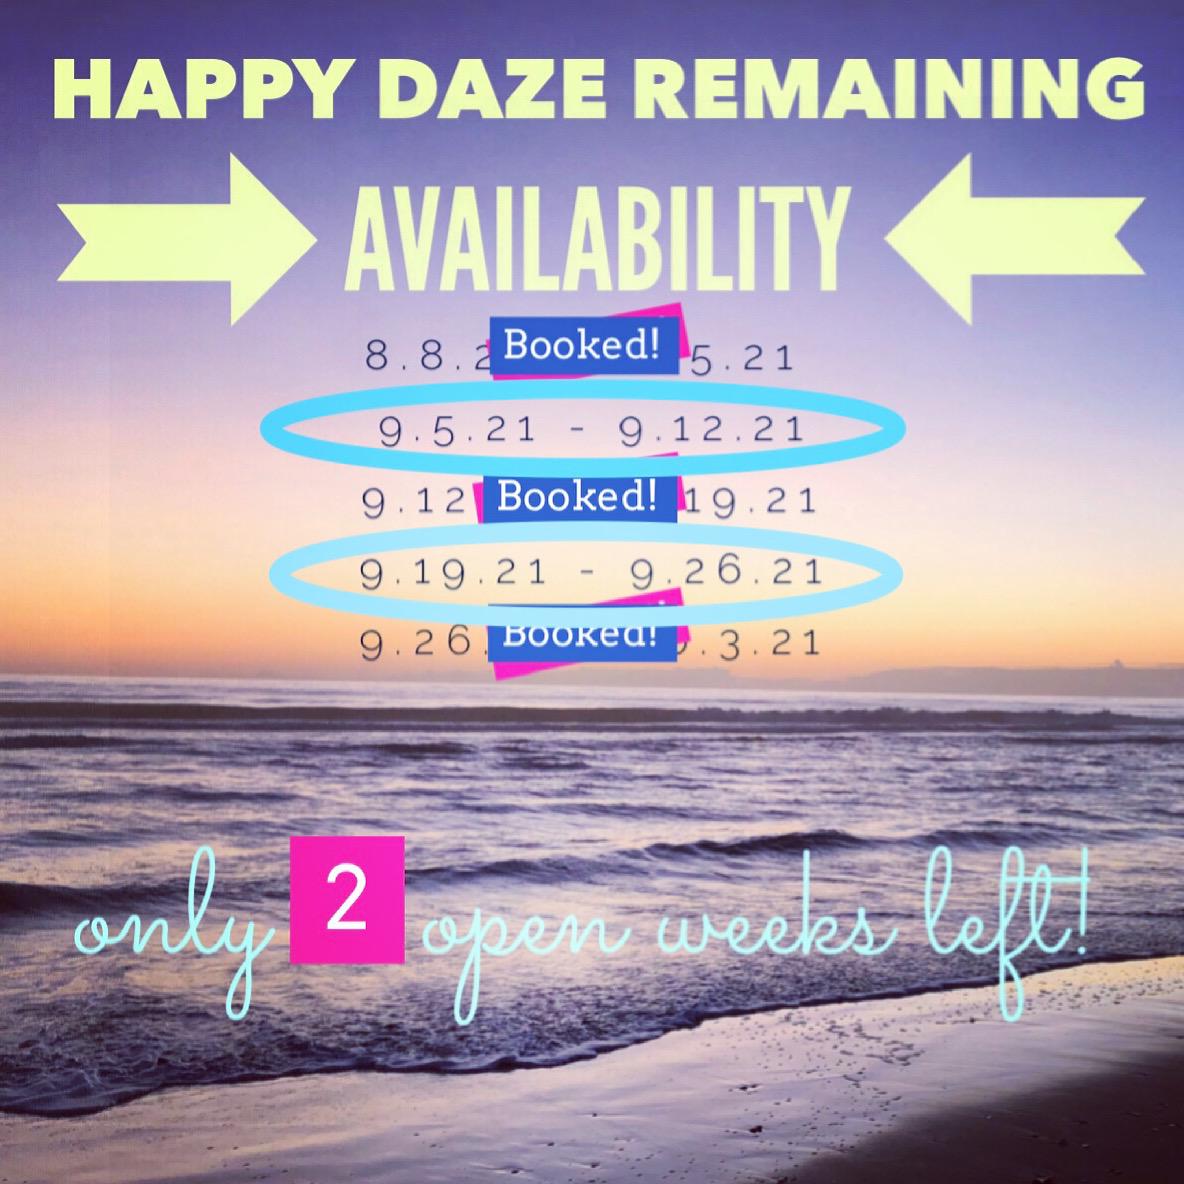 Happy Daze OBX Availability